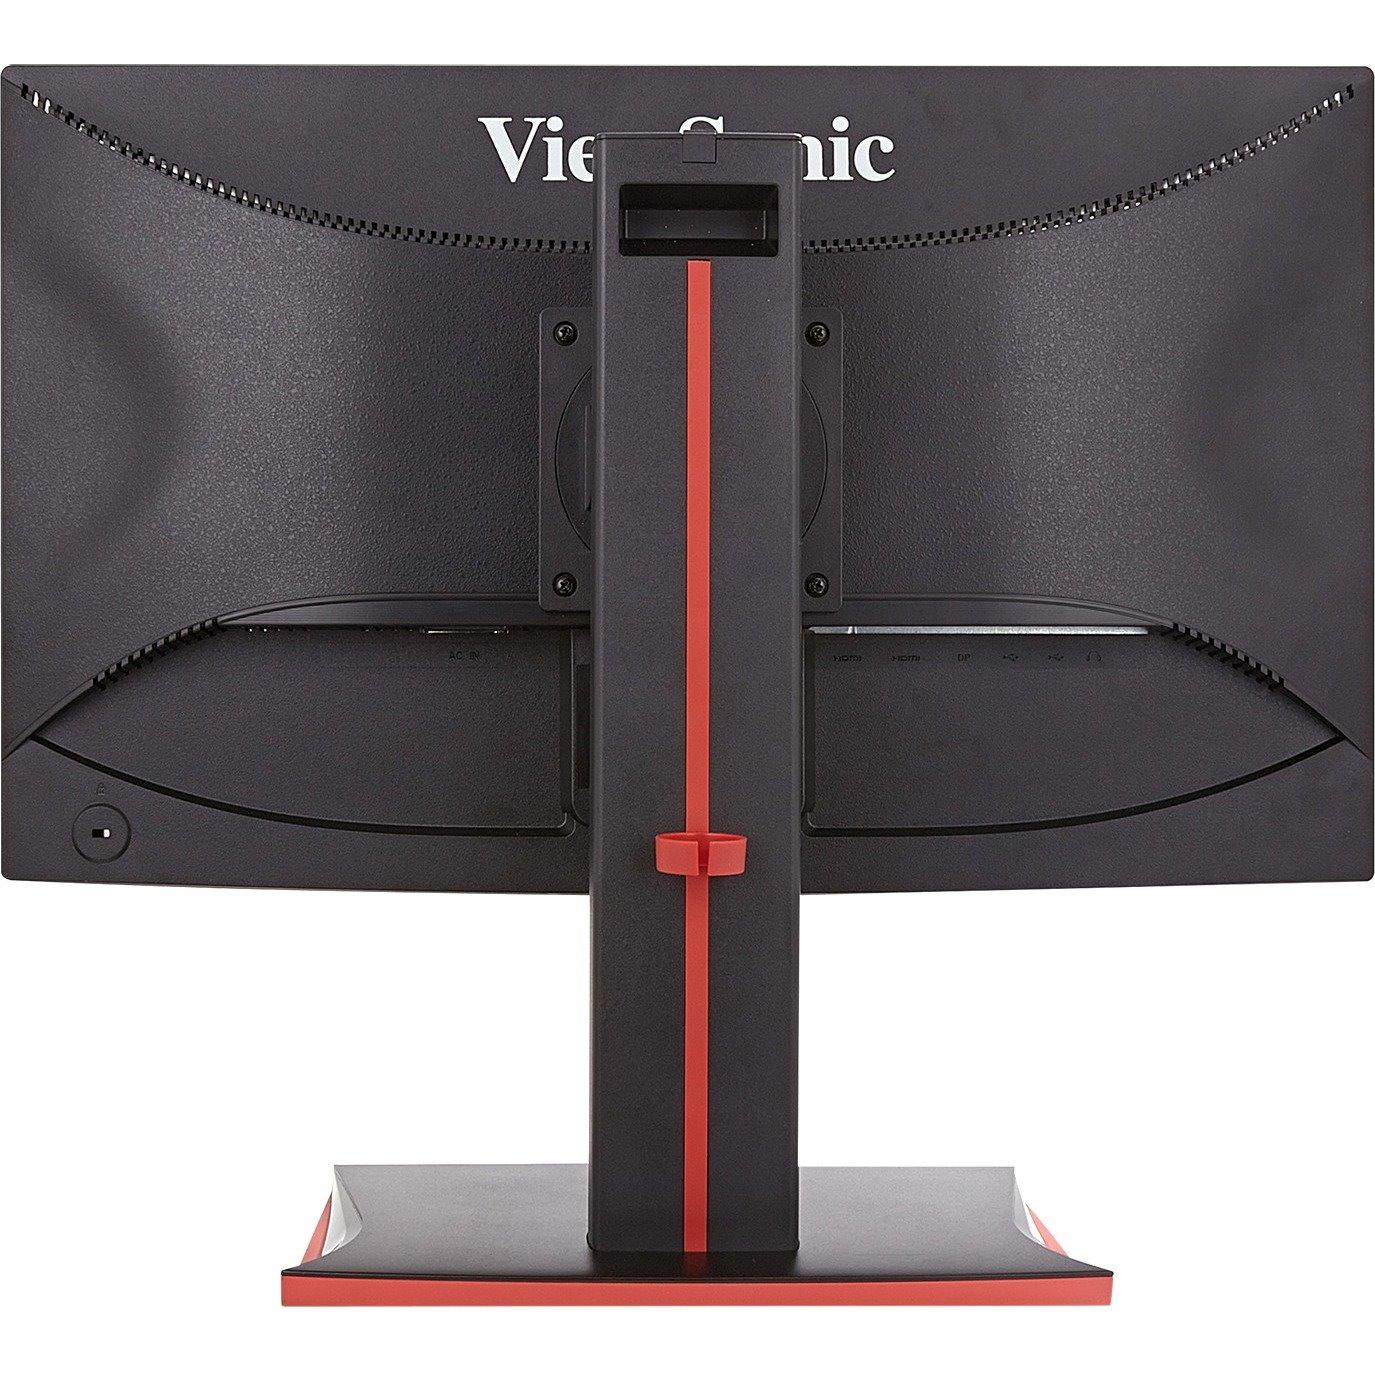 "Viewsonic XG2401 61 cm (24"") Full HD LED LCD Monitor - 16:9 - Black"